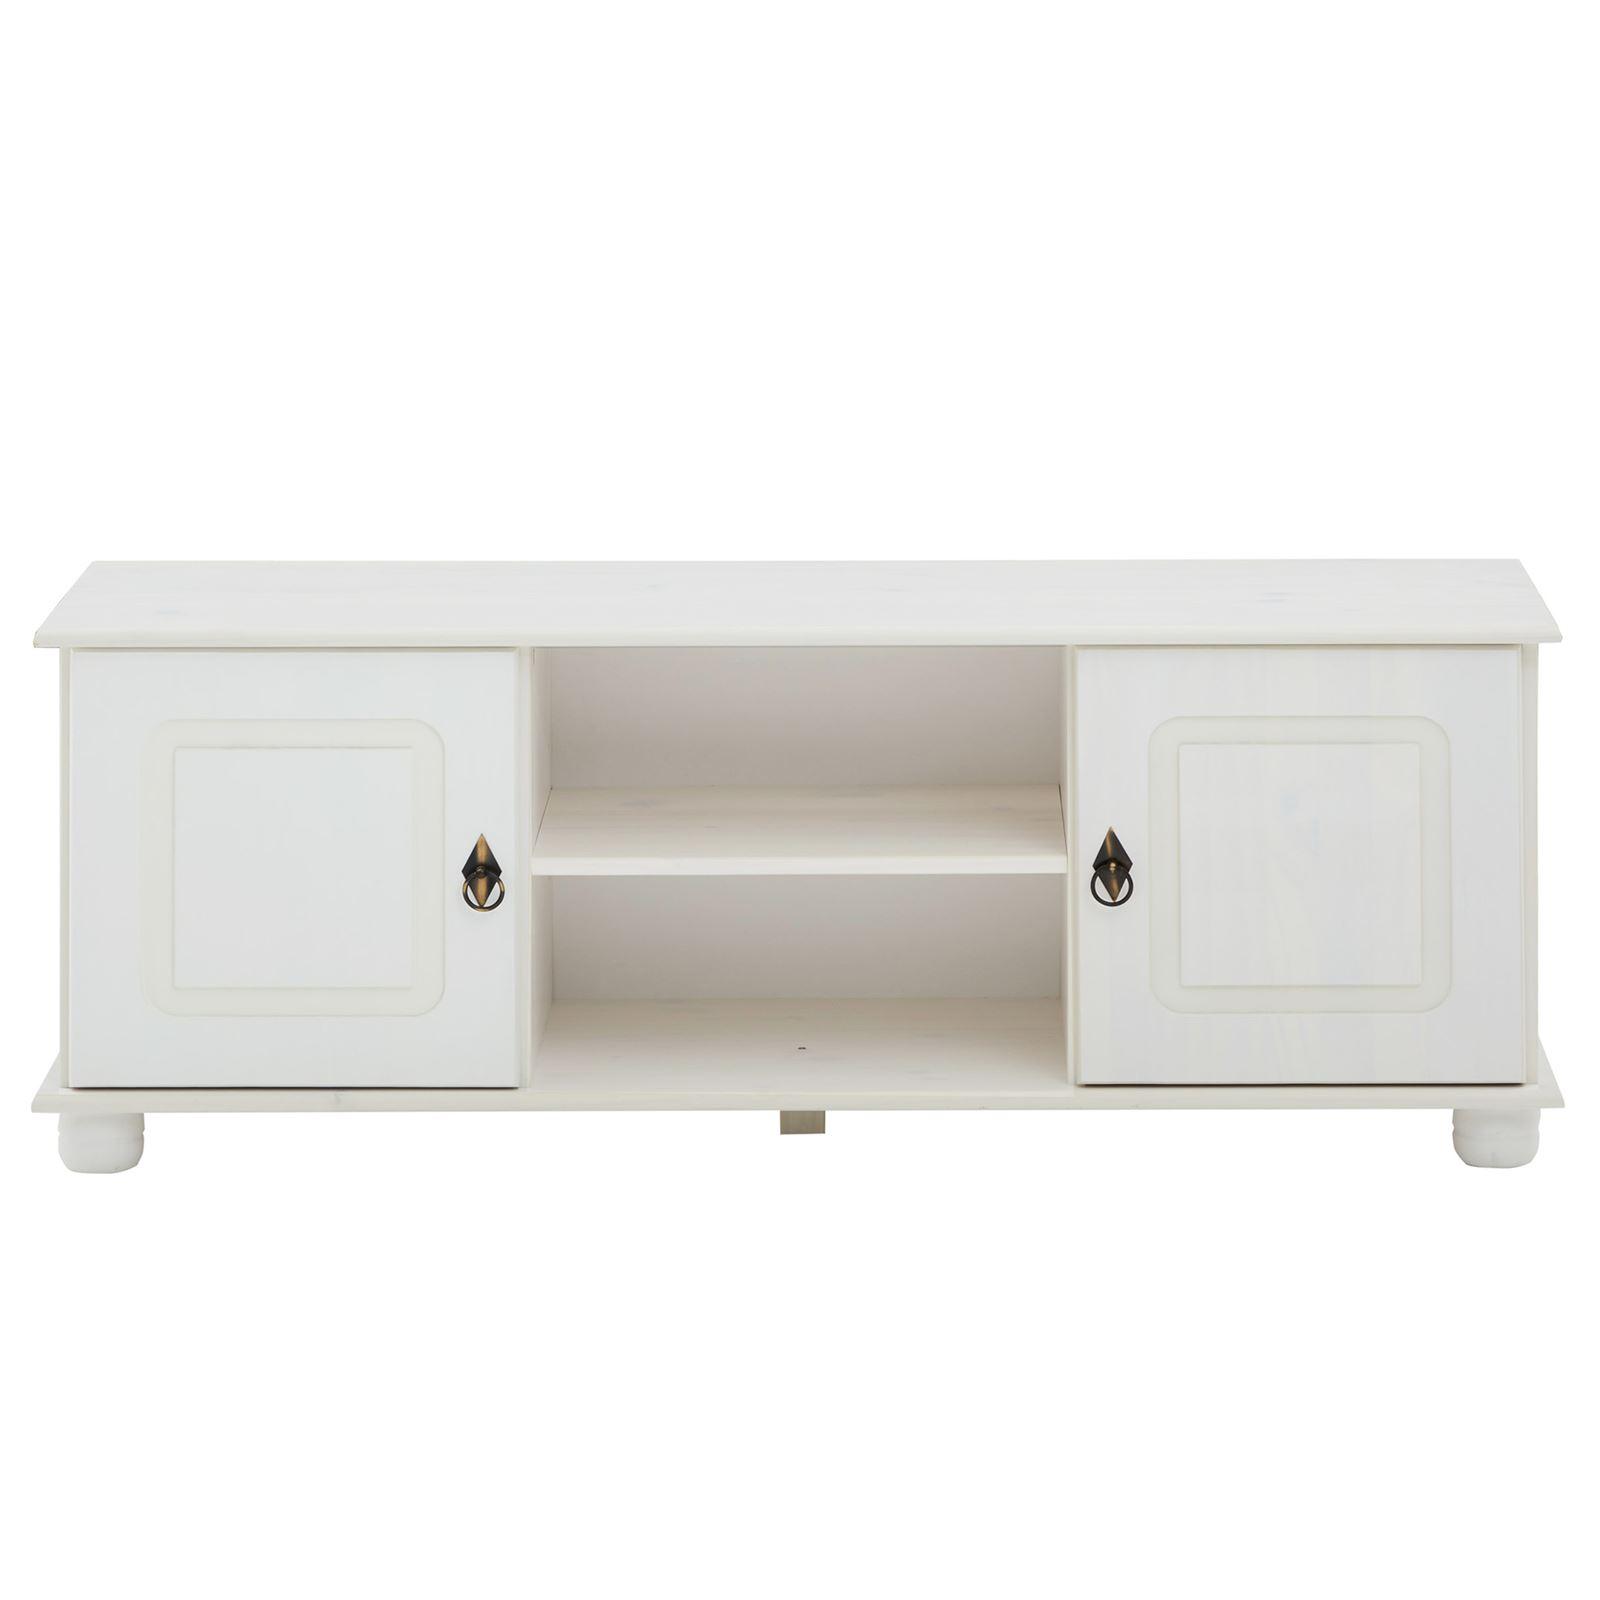 meuble tv en pin belfort 2 portes 2 niches lasur. Black Bedroom Furniture Sets. Home Design Ideas